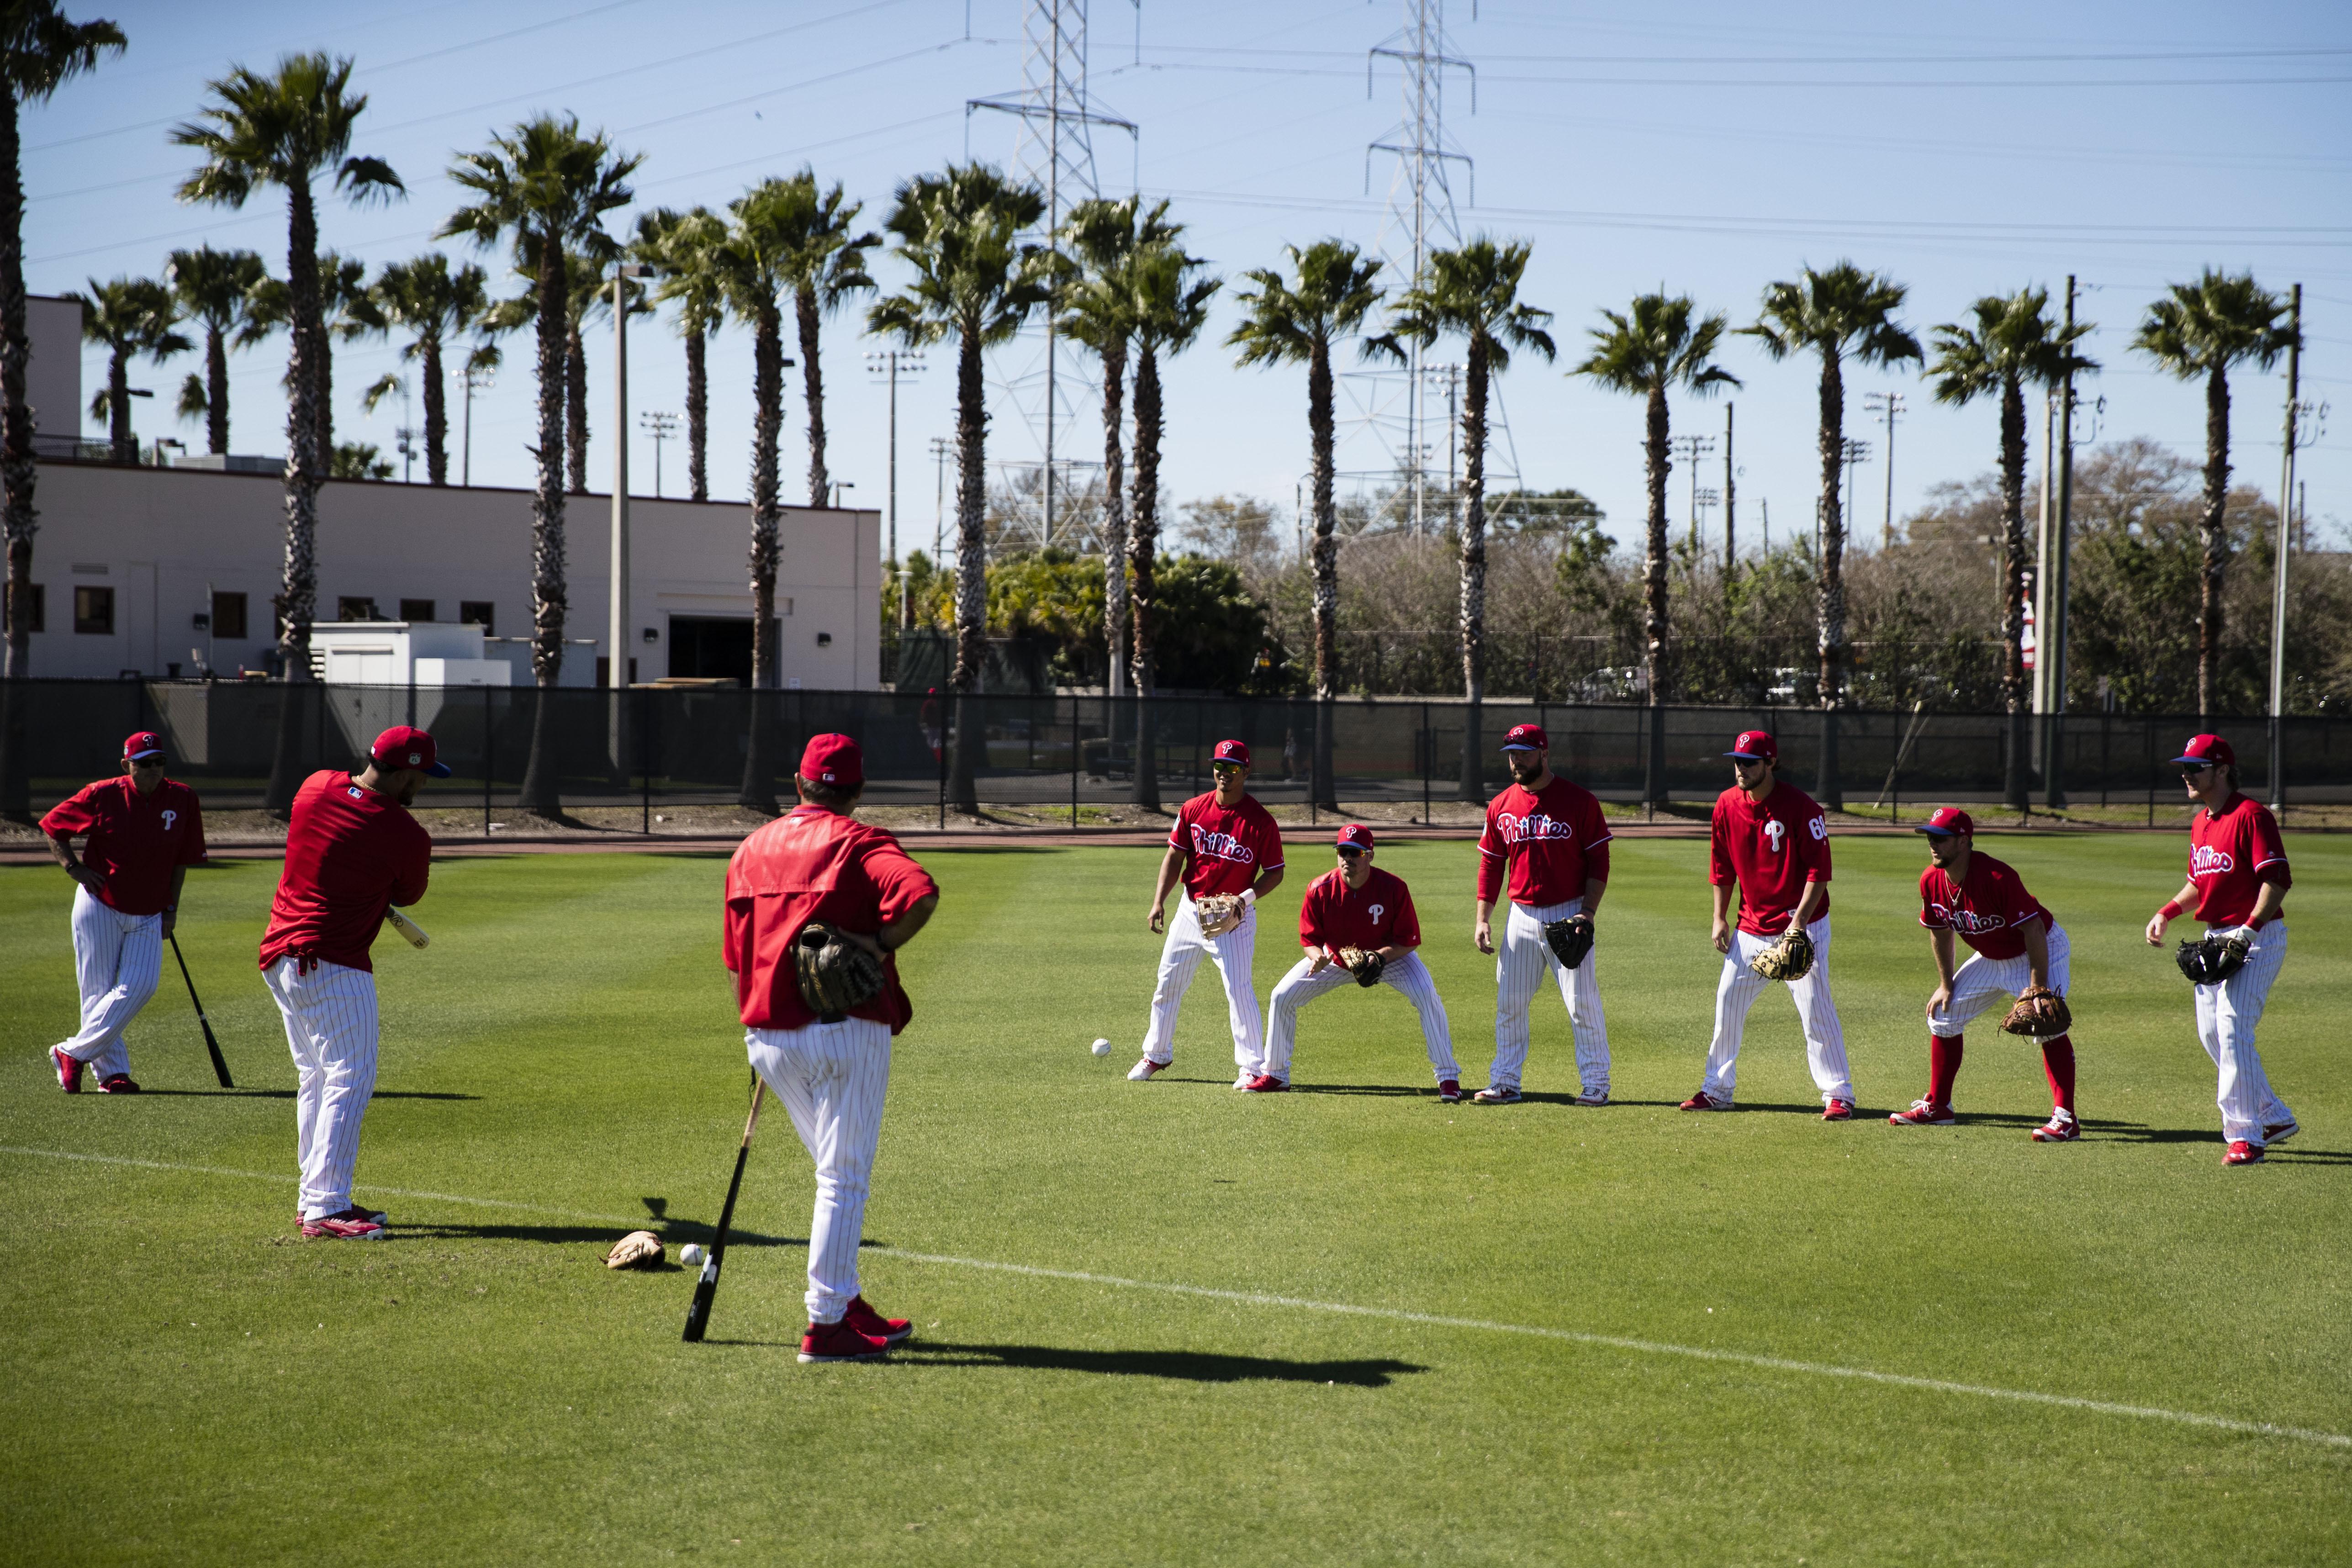 Phillies_spring_baseball_54564